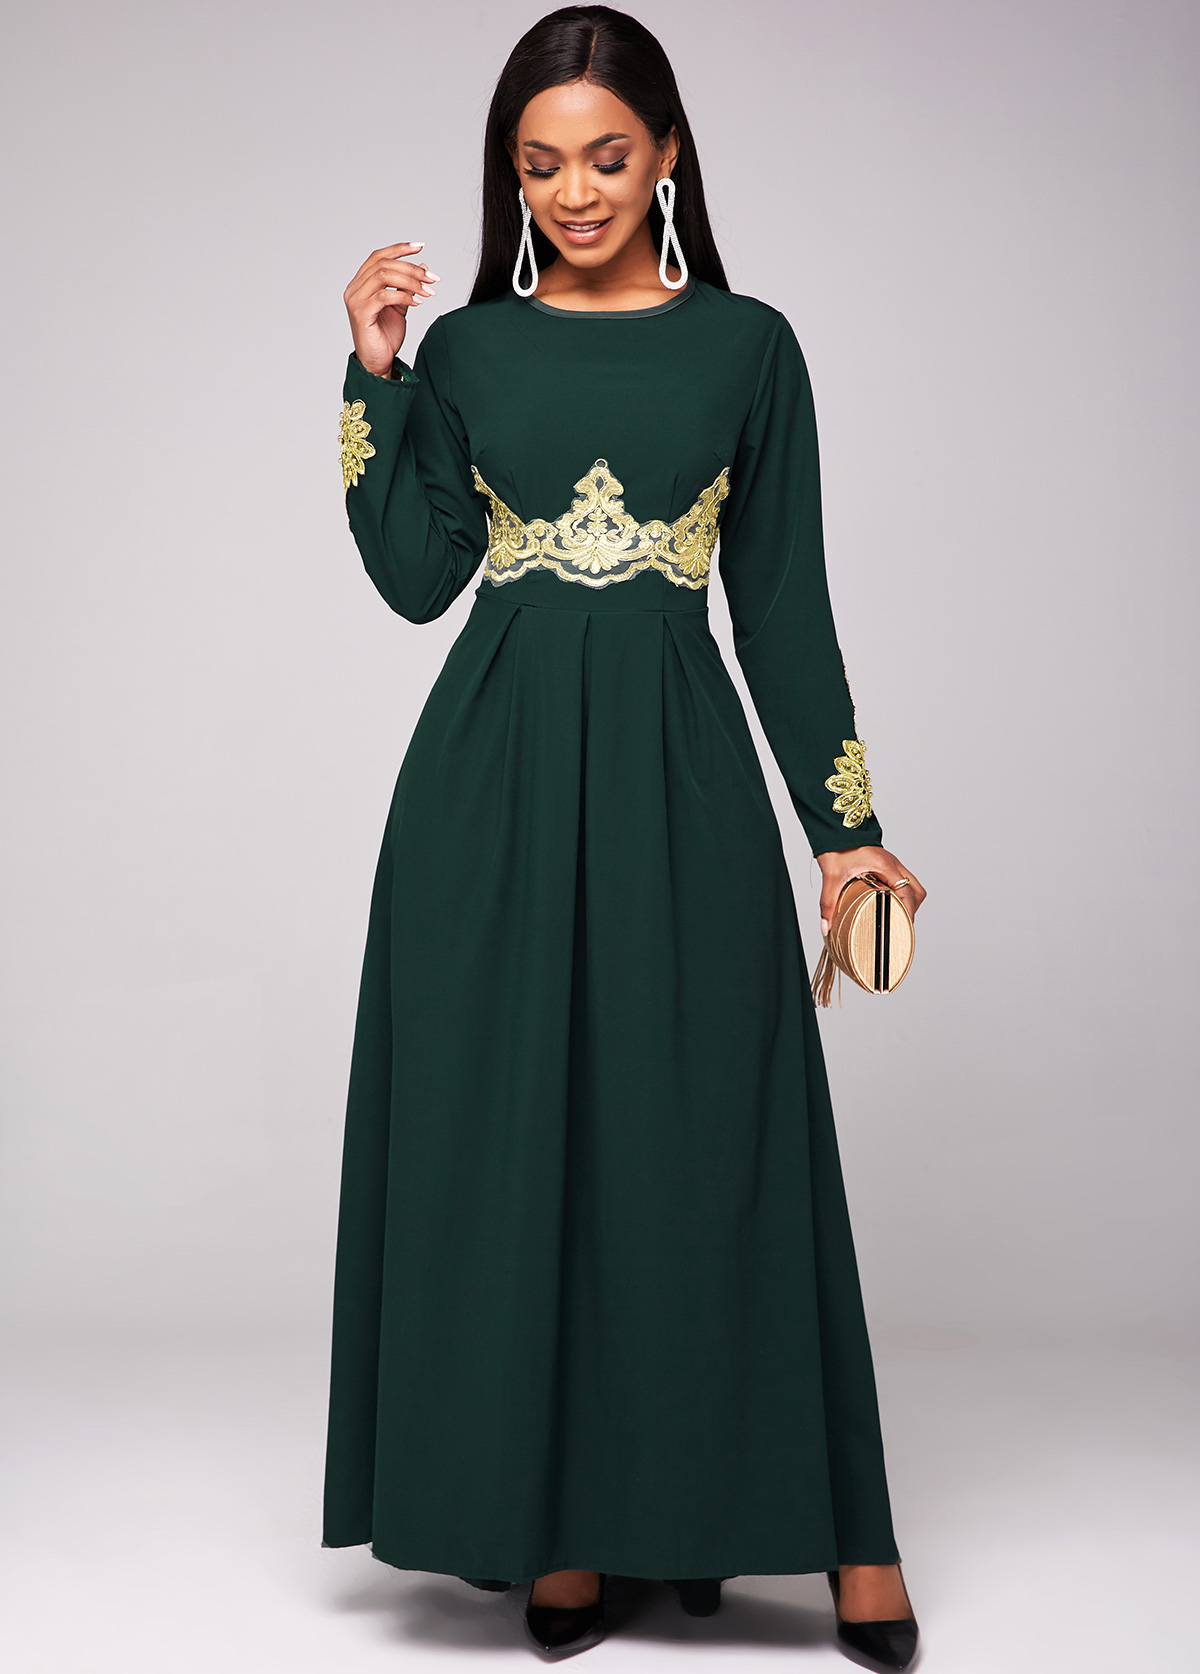 Long Sleeve Lace Stitching Round Neck Dress